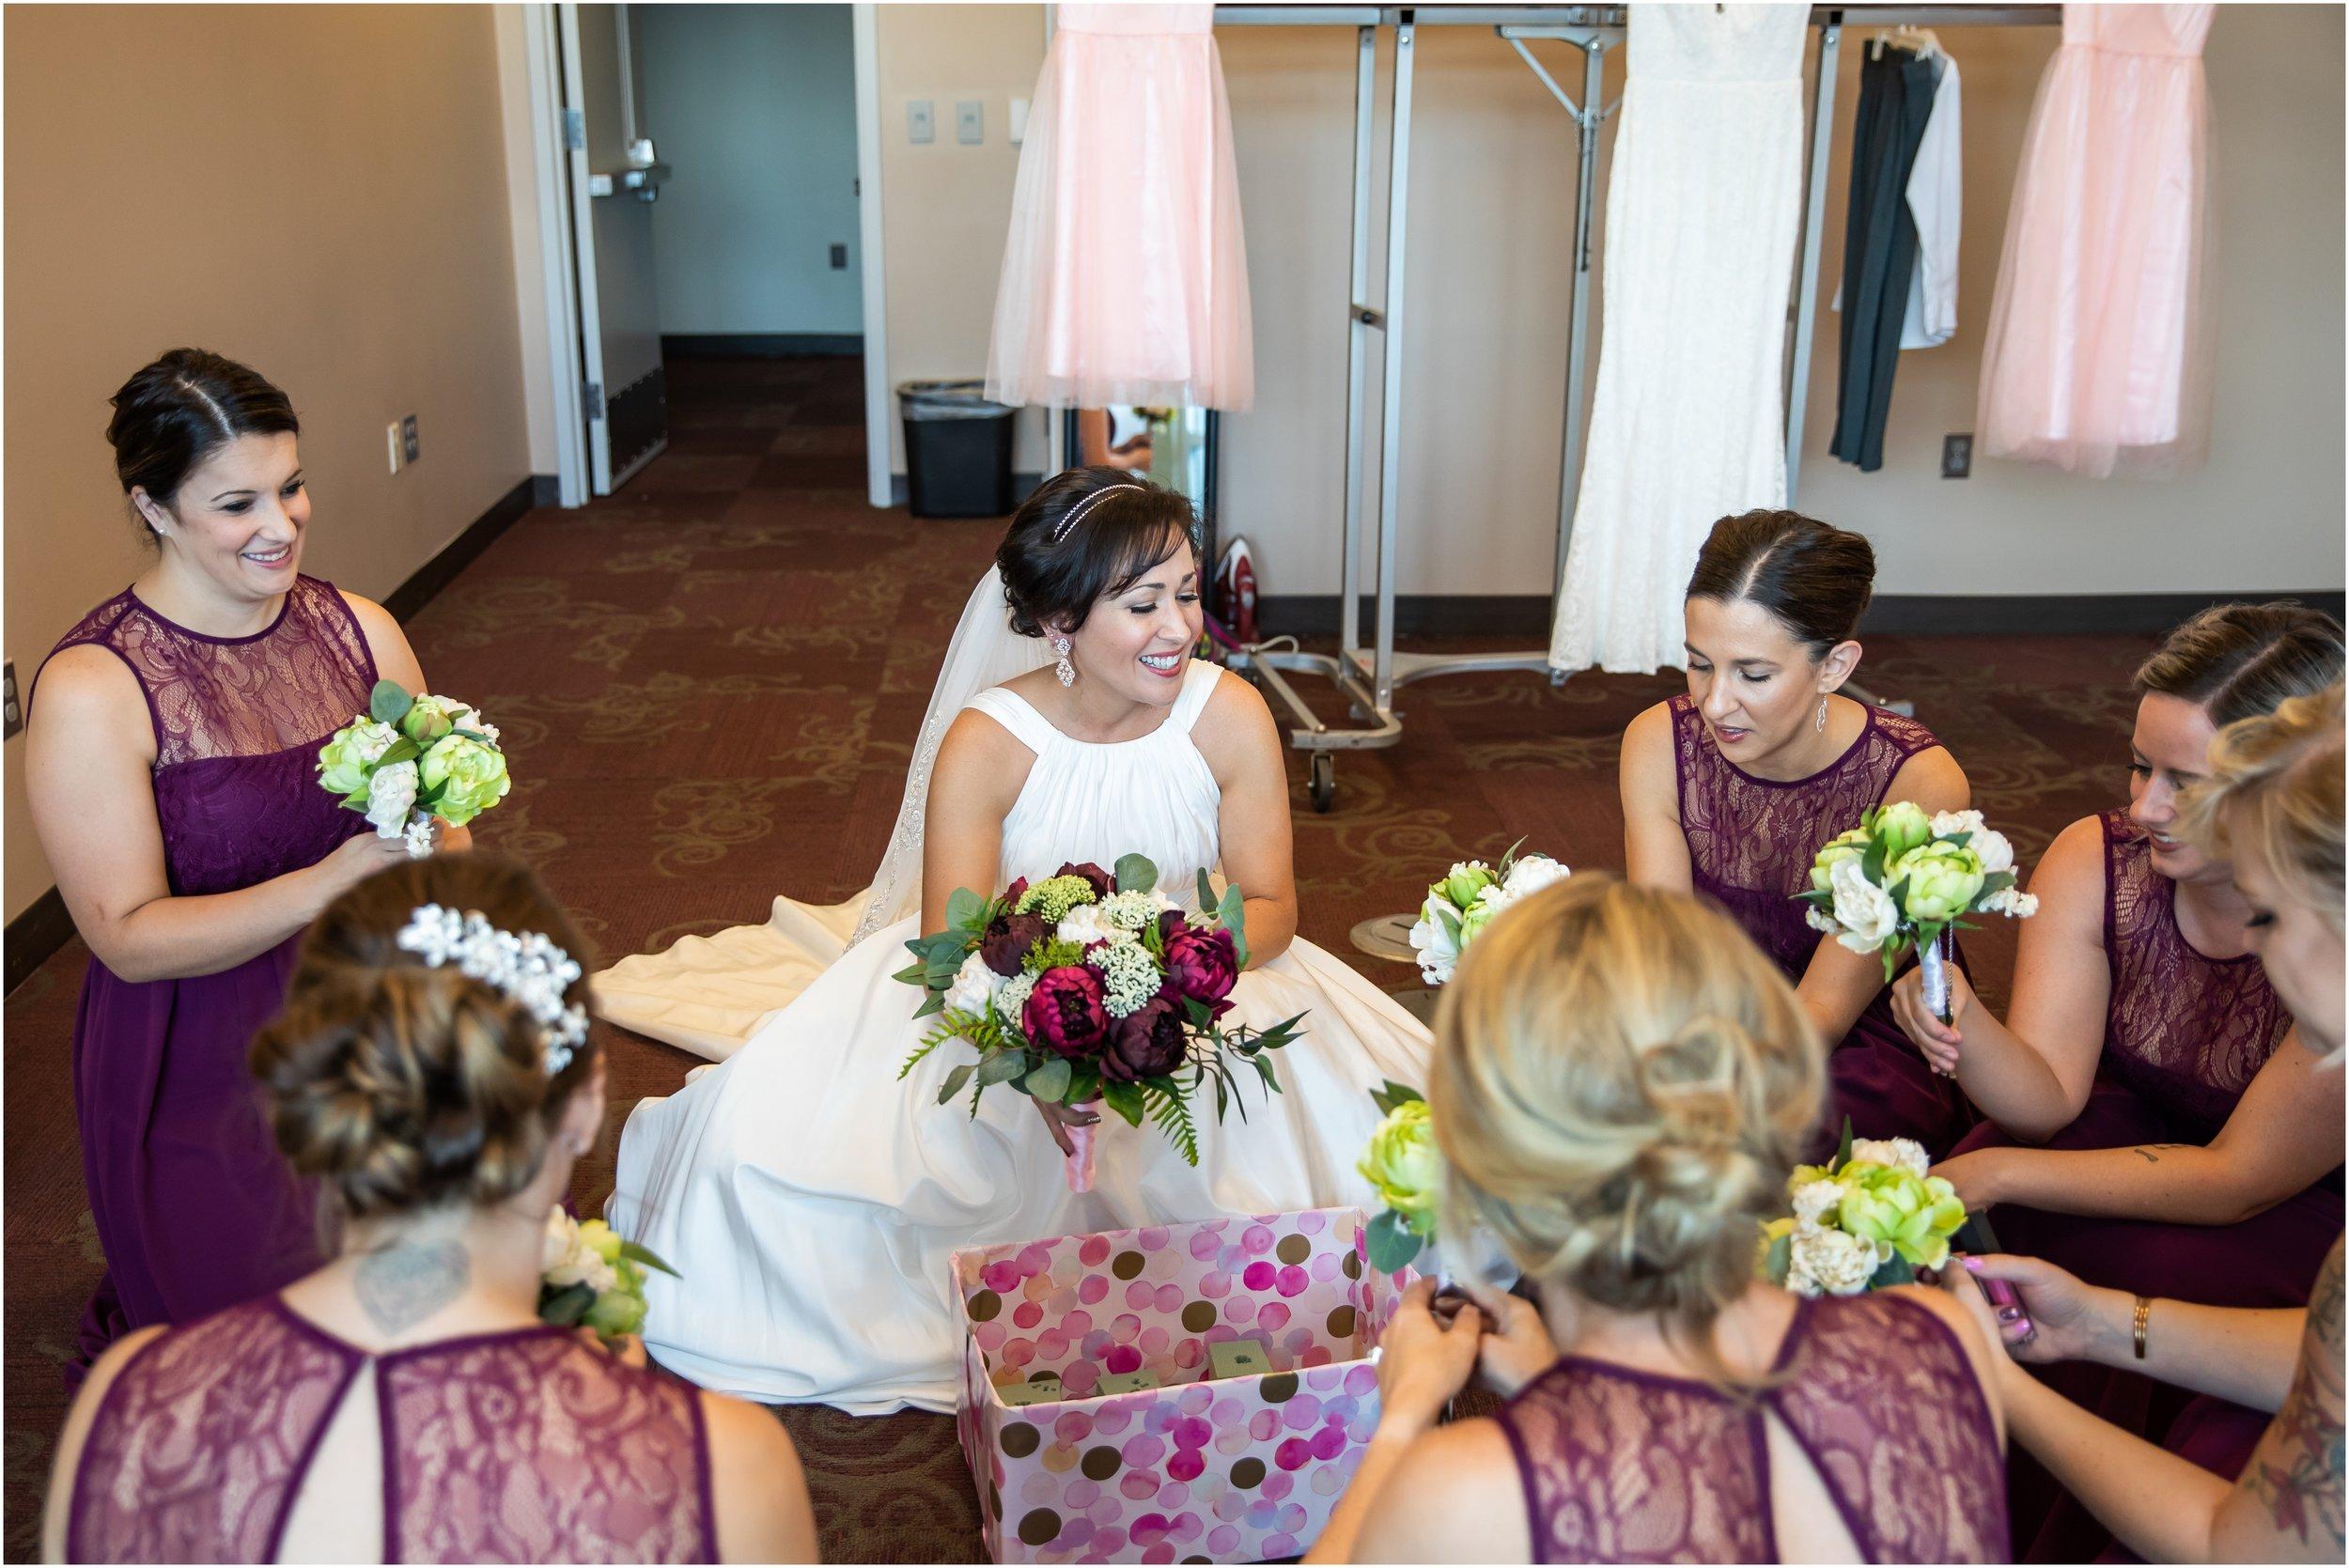 grand junction wedding photographer 9.jpg